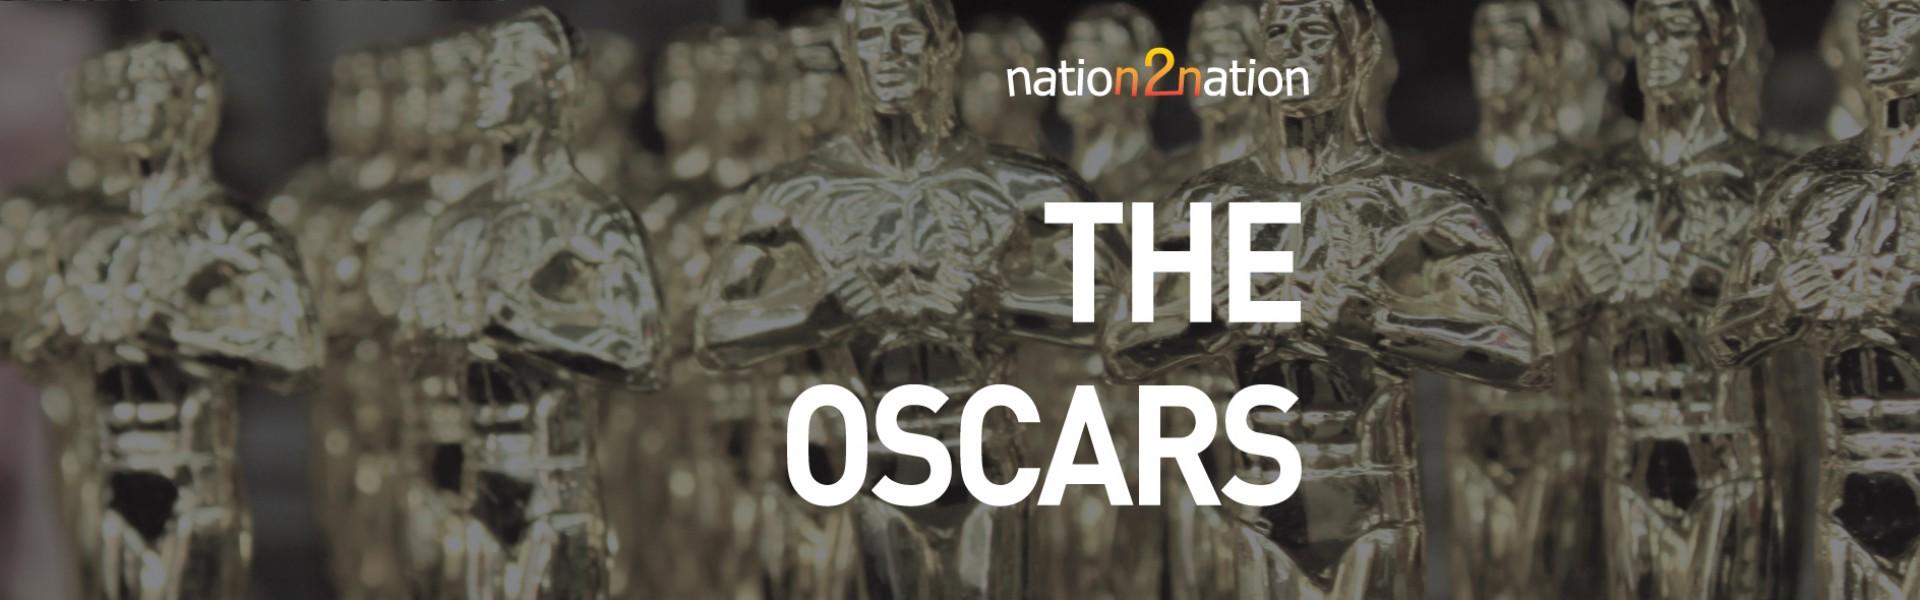 NATION2NATION – The Oscars